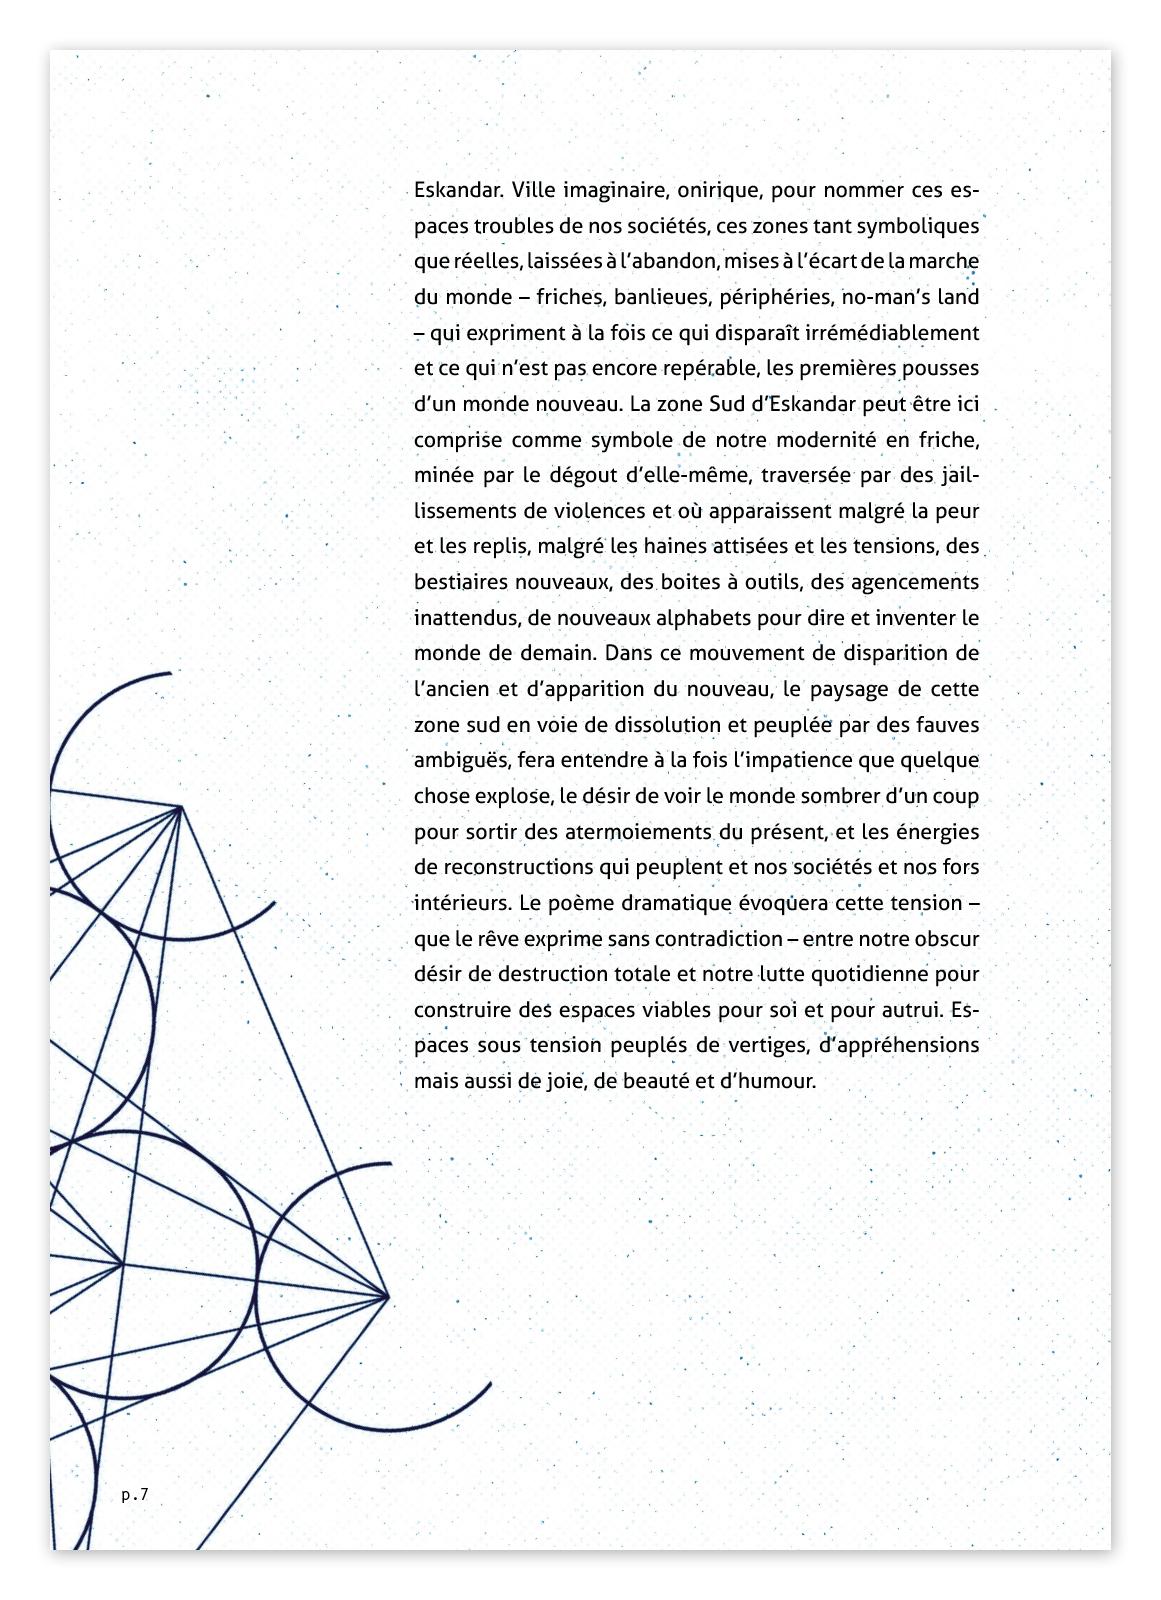 AnthologieOnirique-LeCollectifEskandar-PrintMaison-7